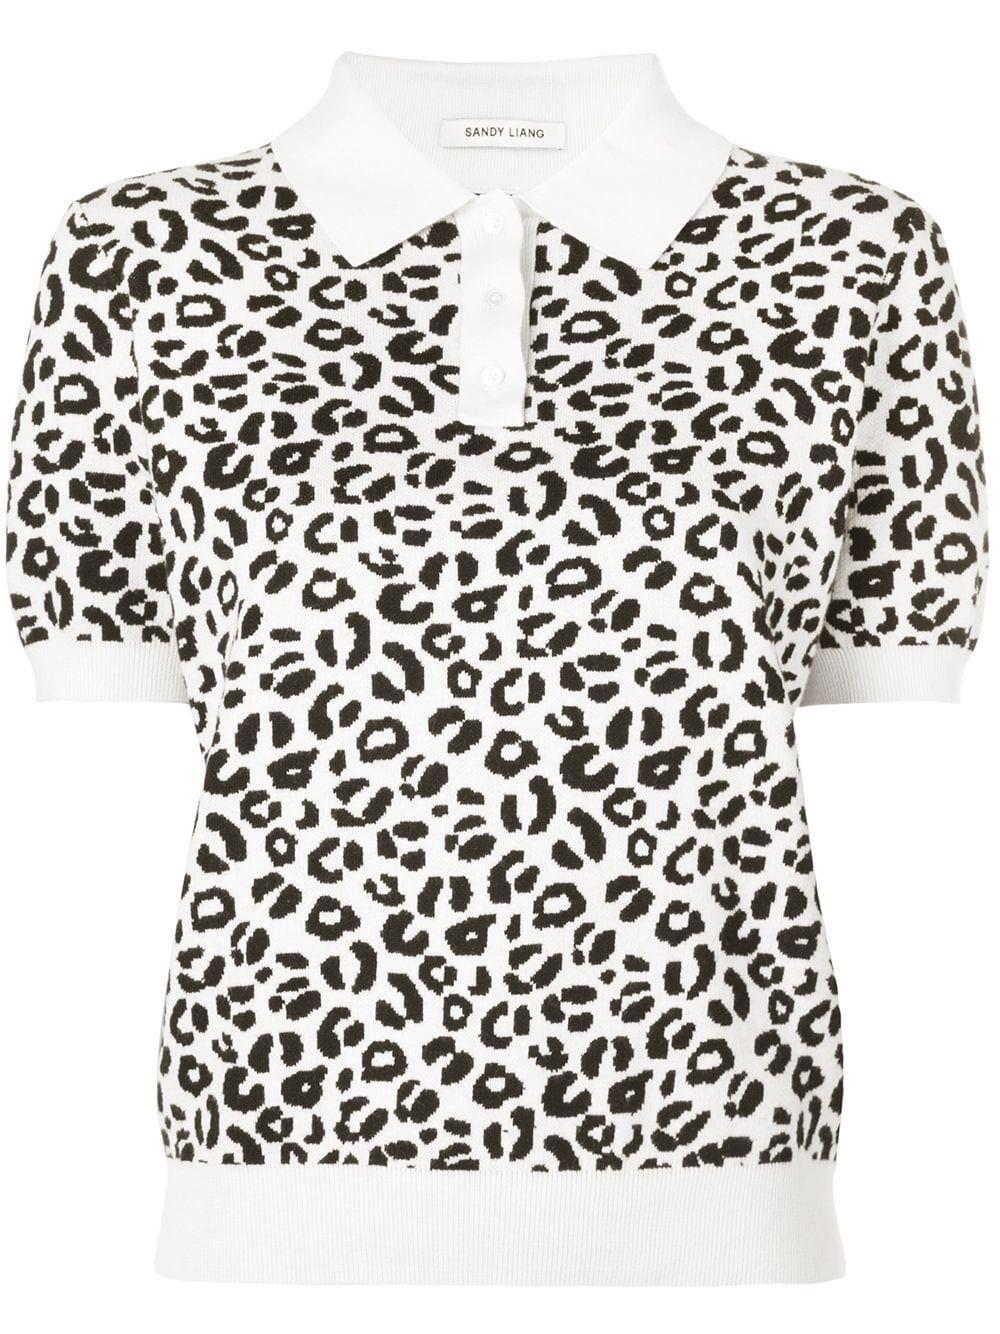 cashmere Sandy Liang Leopard Print Polo Shirt – Farfetch Cashmere Shirt